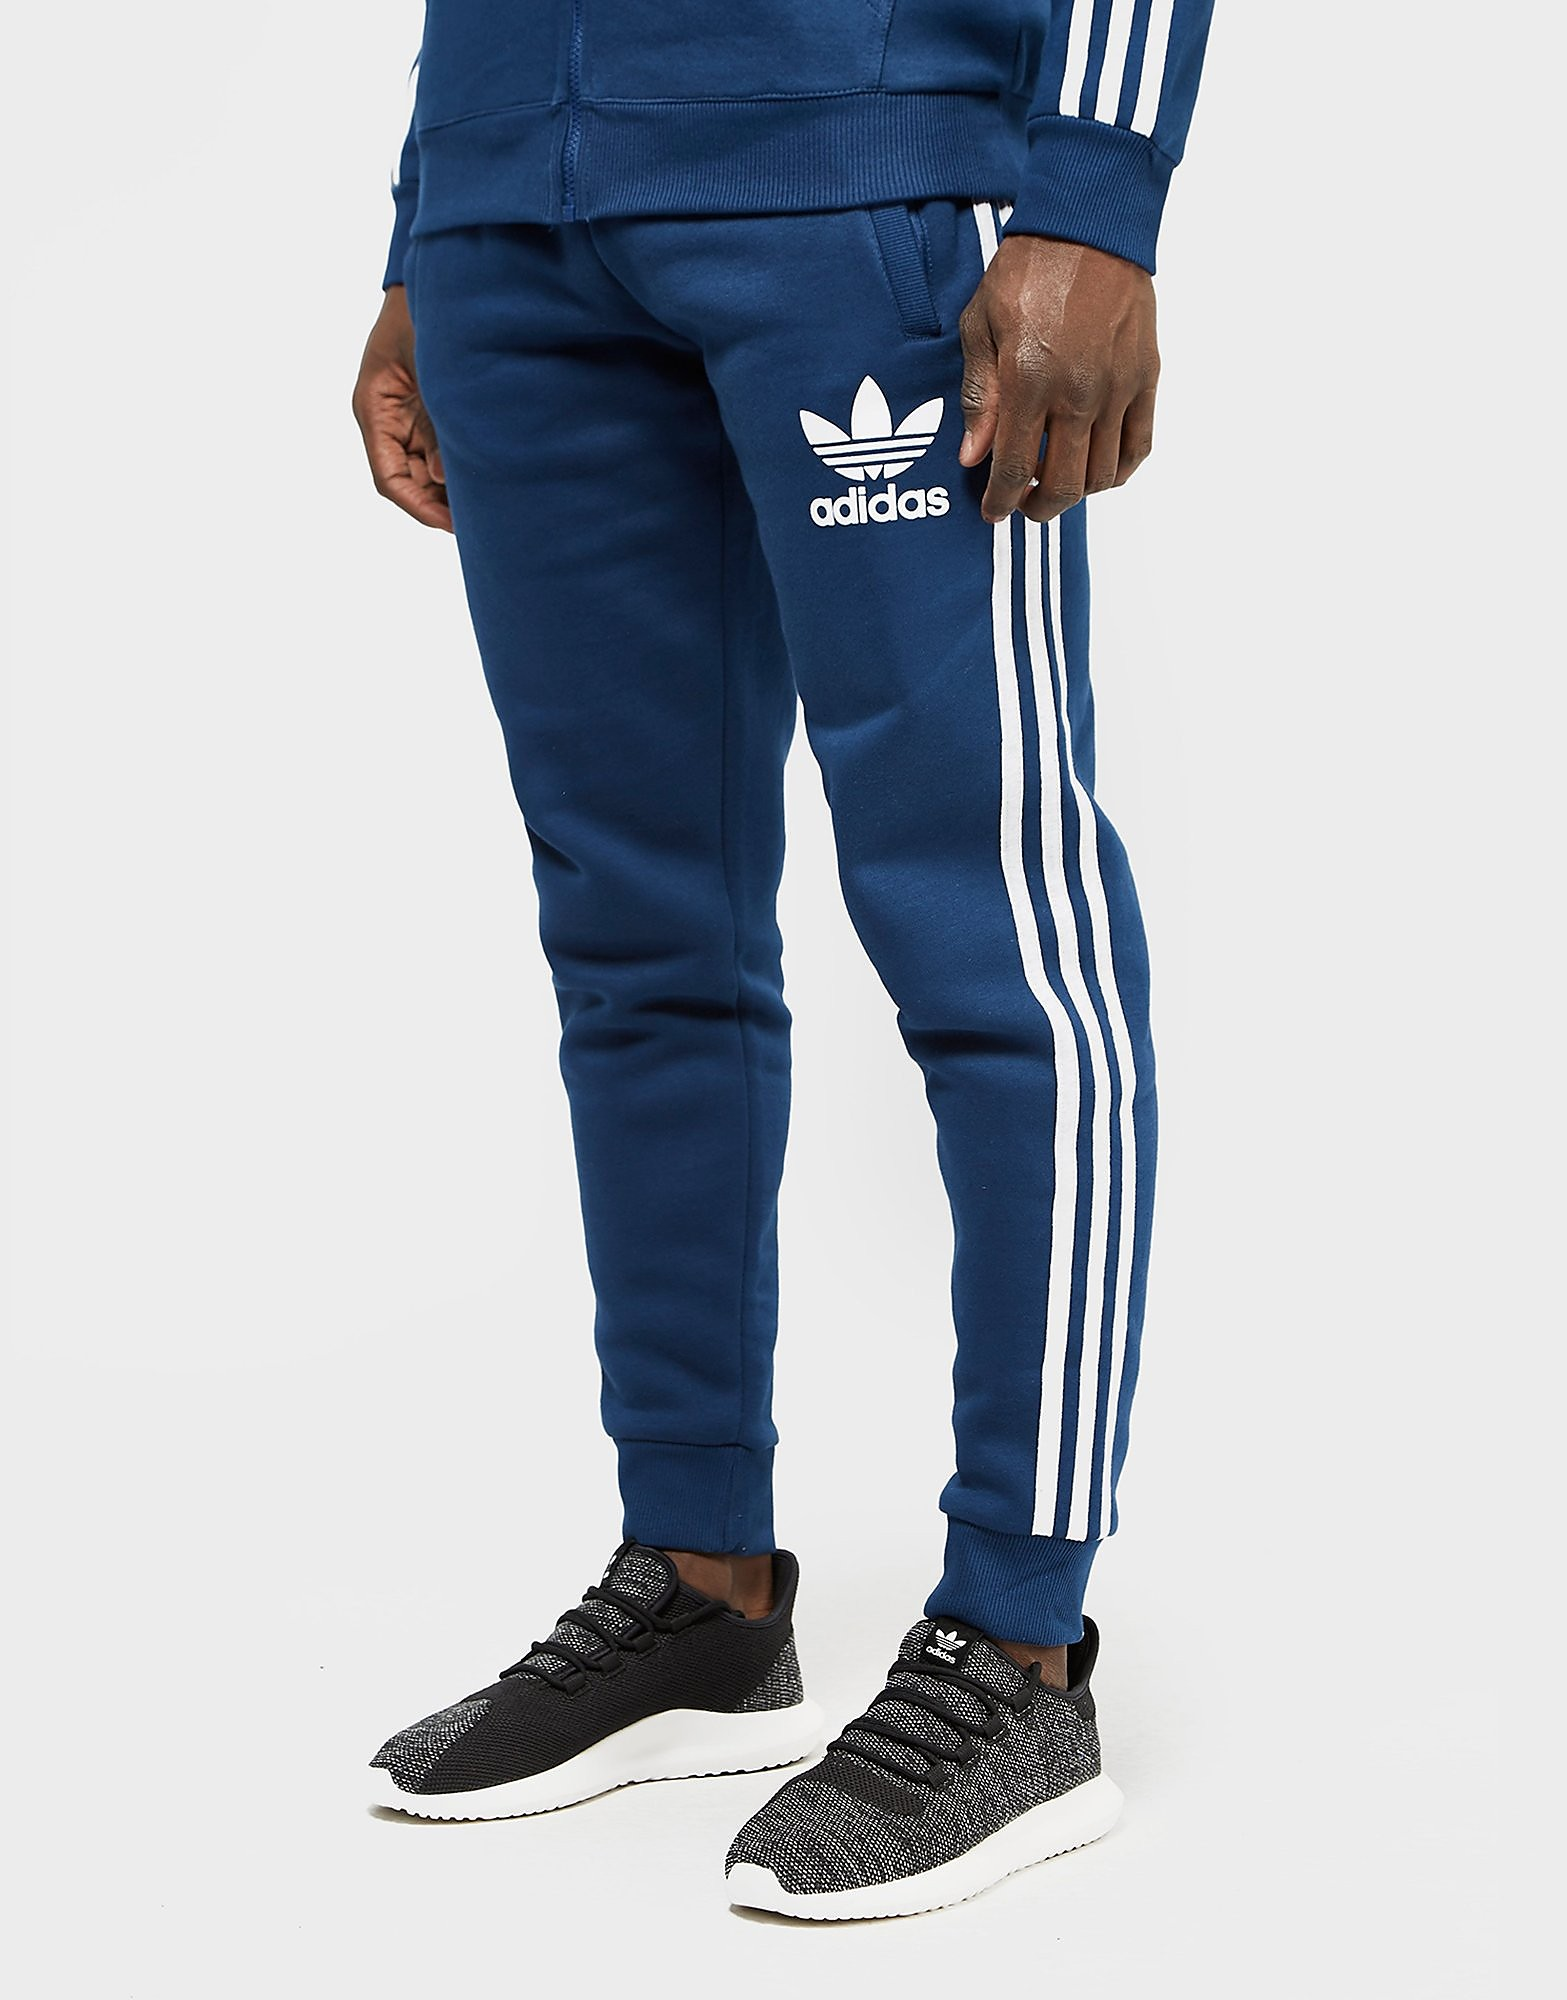 adidas Originals California Pants  Oxford BlueGrey Oxford BlueGrey